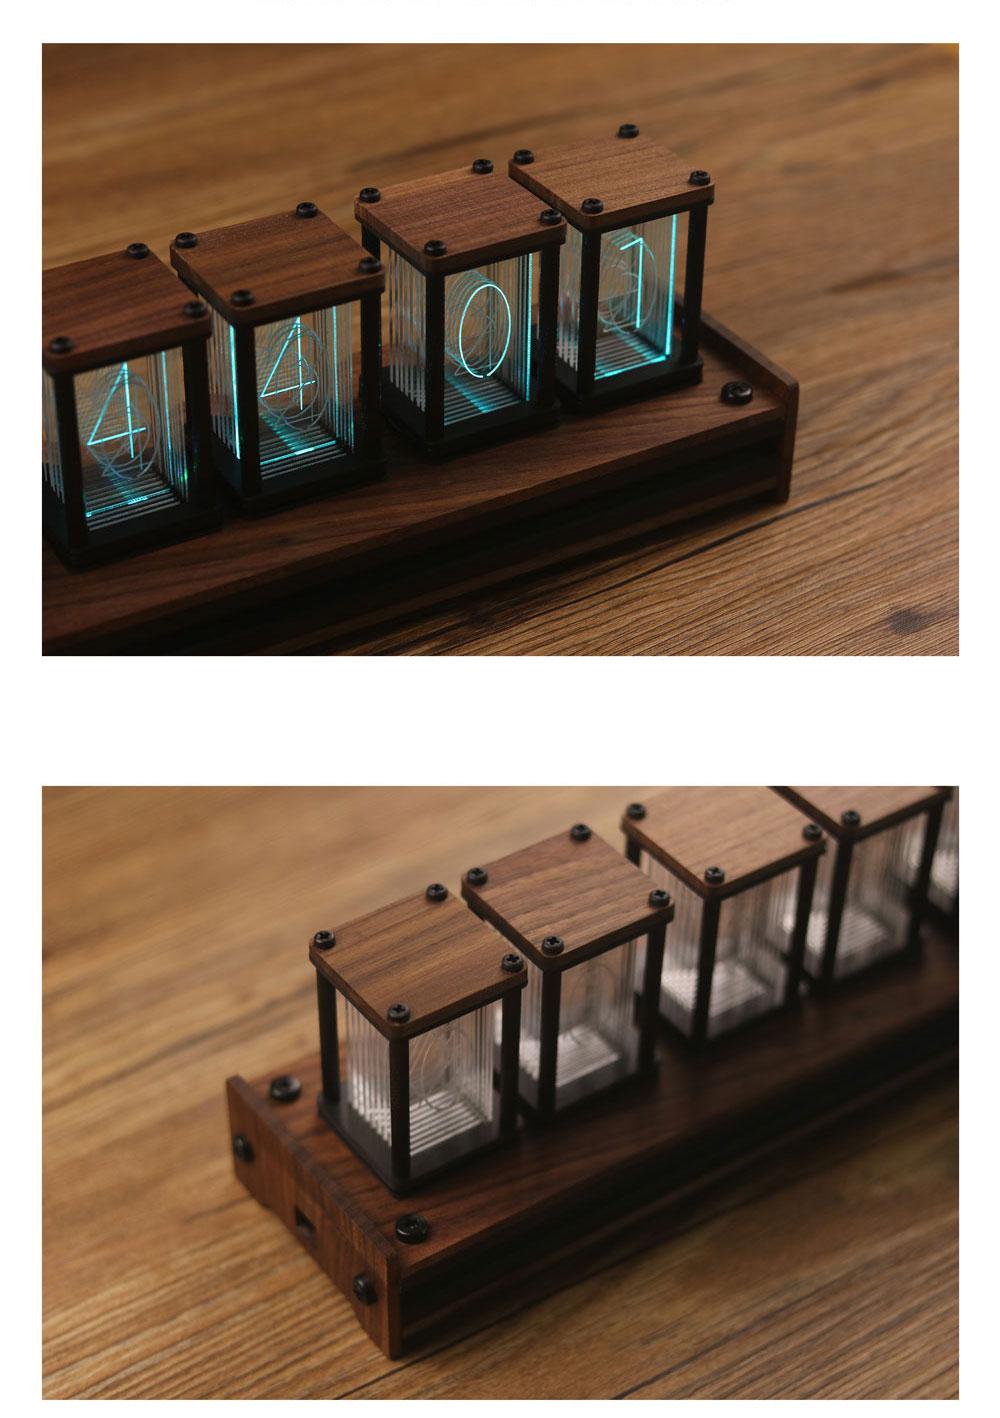 Rgb Led 6 Bit Glow Digital Clock Nixie Tube Clock Kit Diy Electronic R Ezbuypay In 2020 Diy Electronics Electronics Projects Diy Electronics Projects